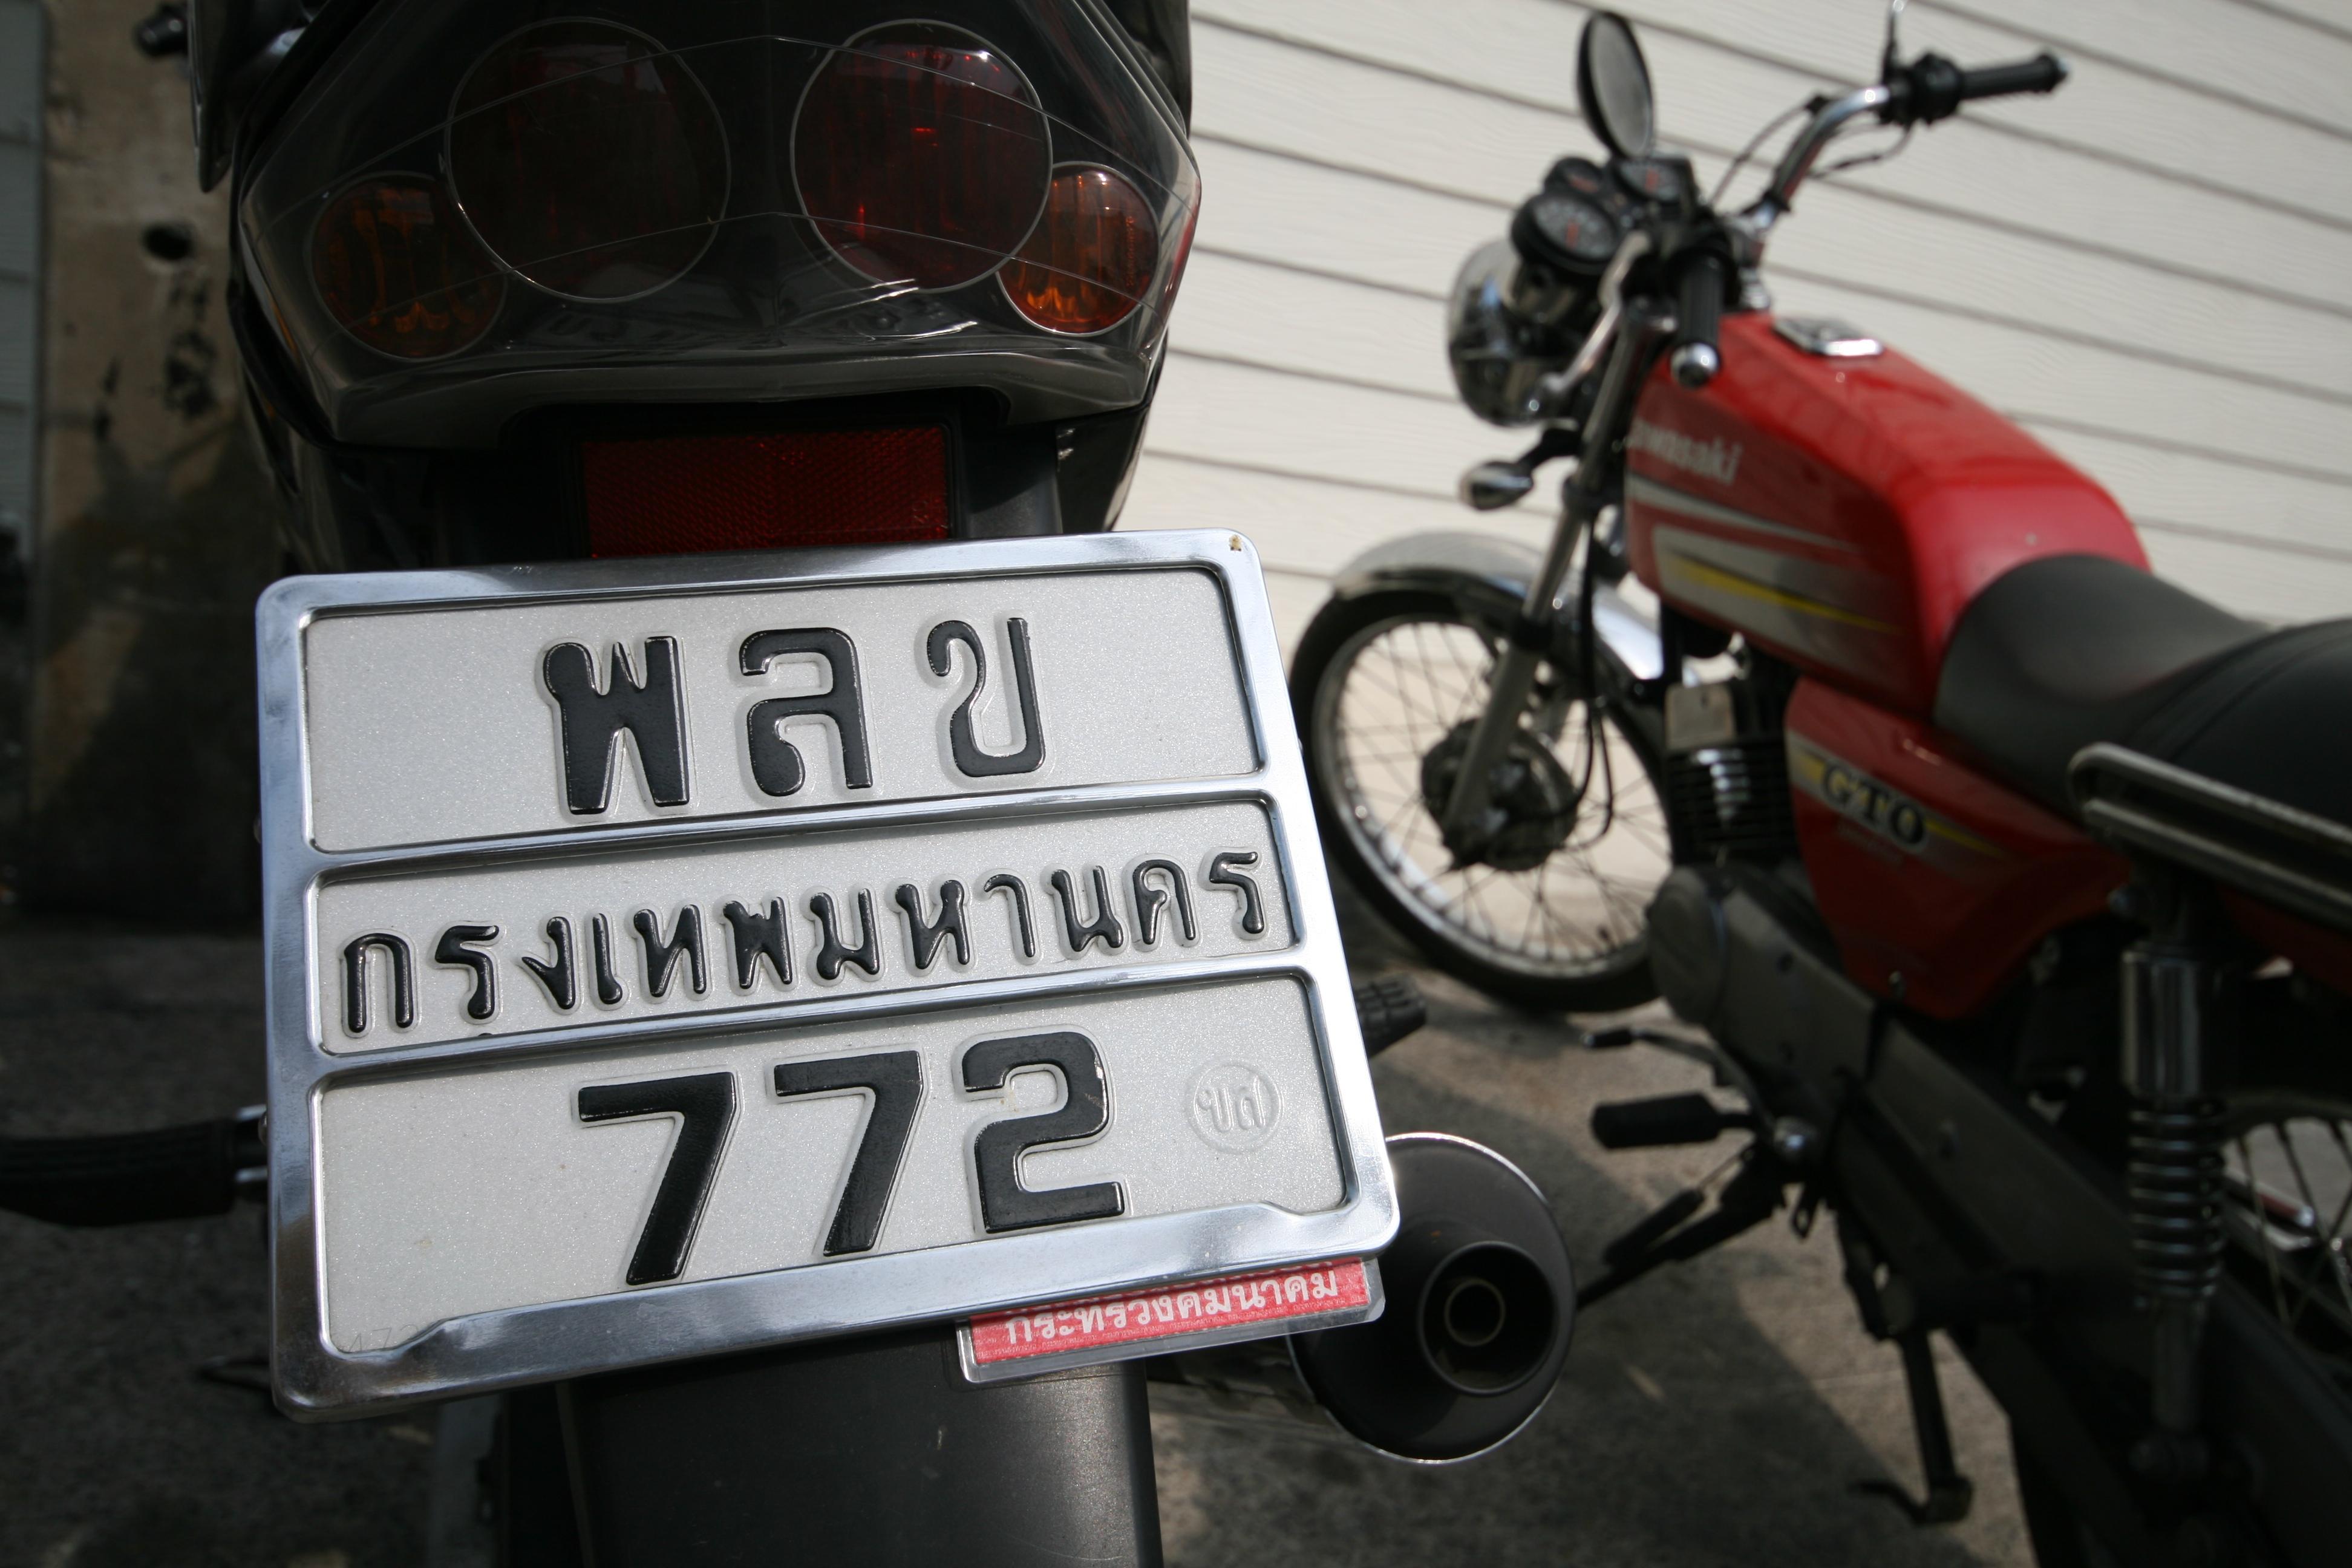 File:Motorcycle plate Thailand 772.jpg